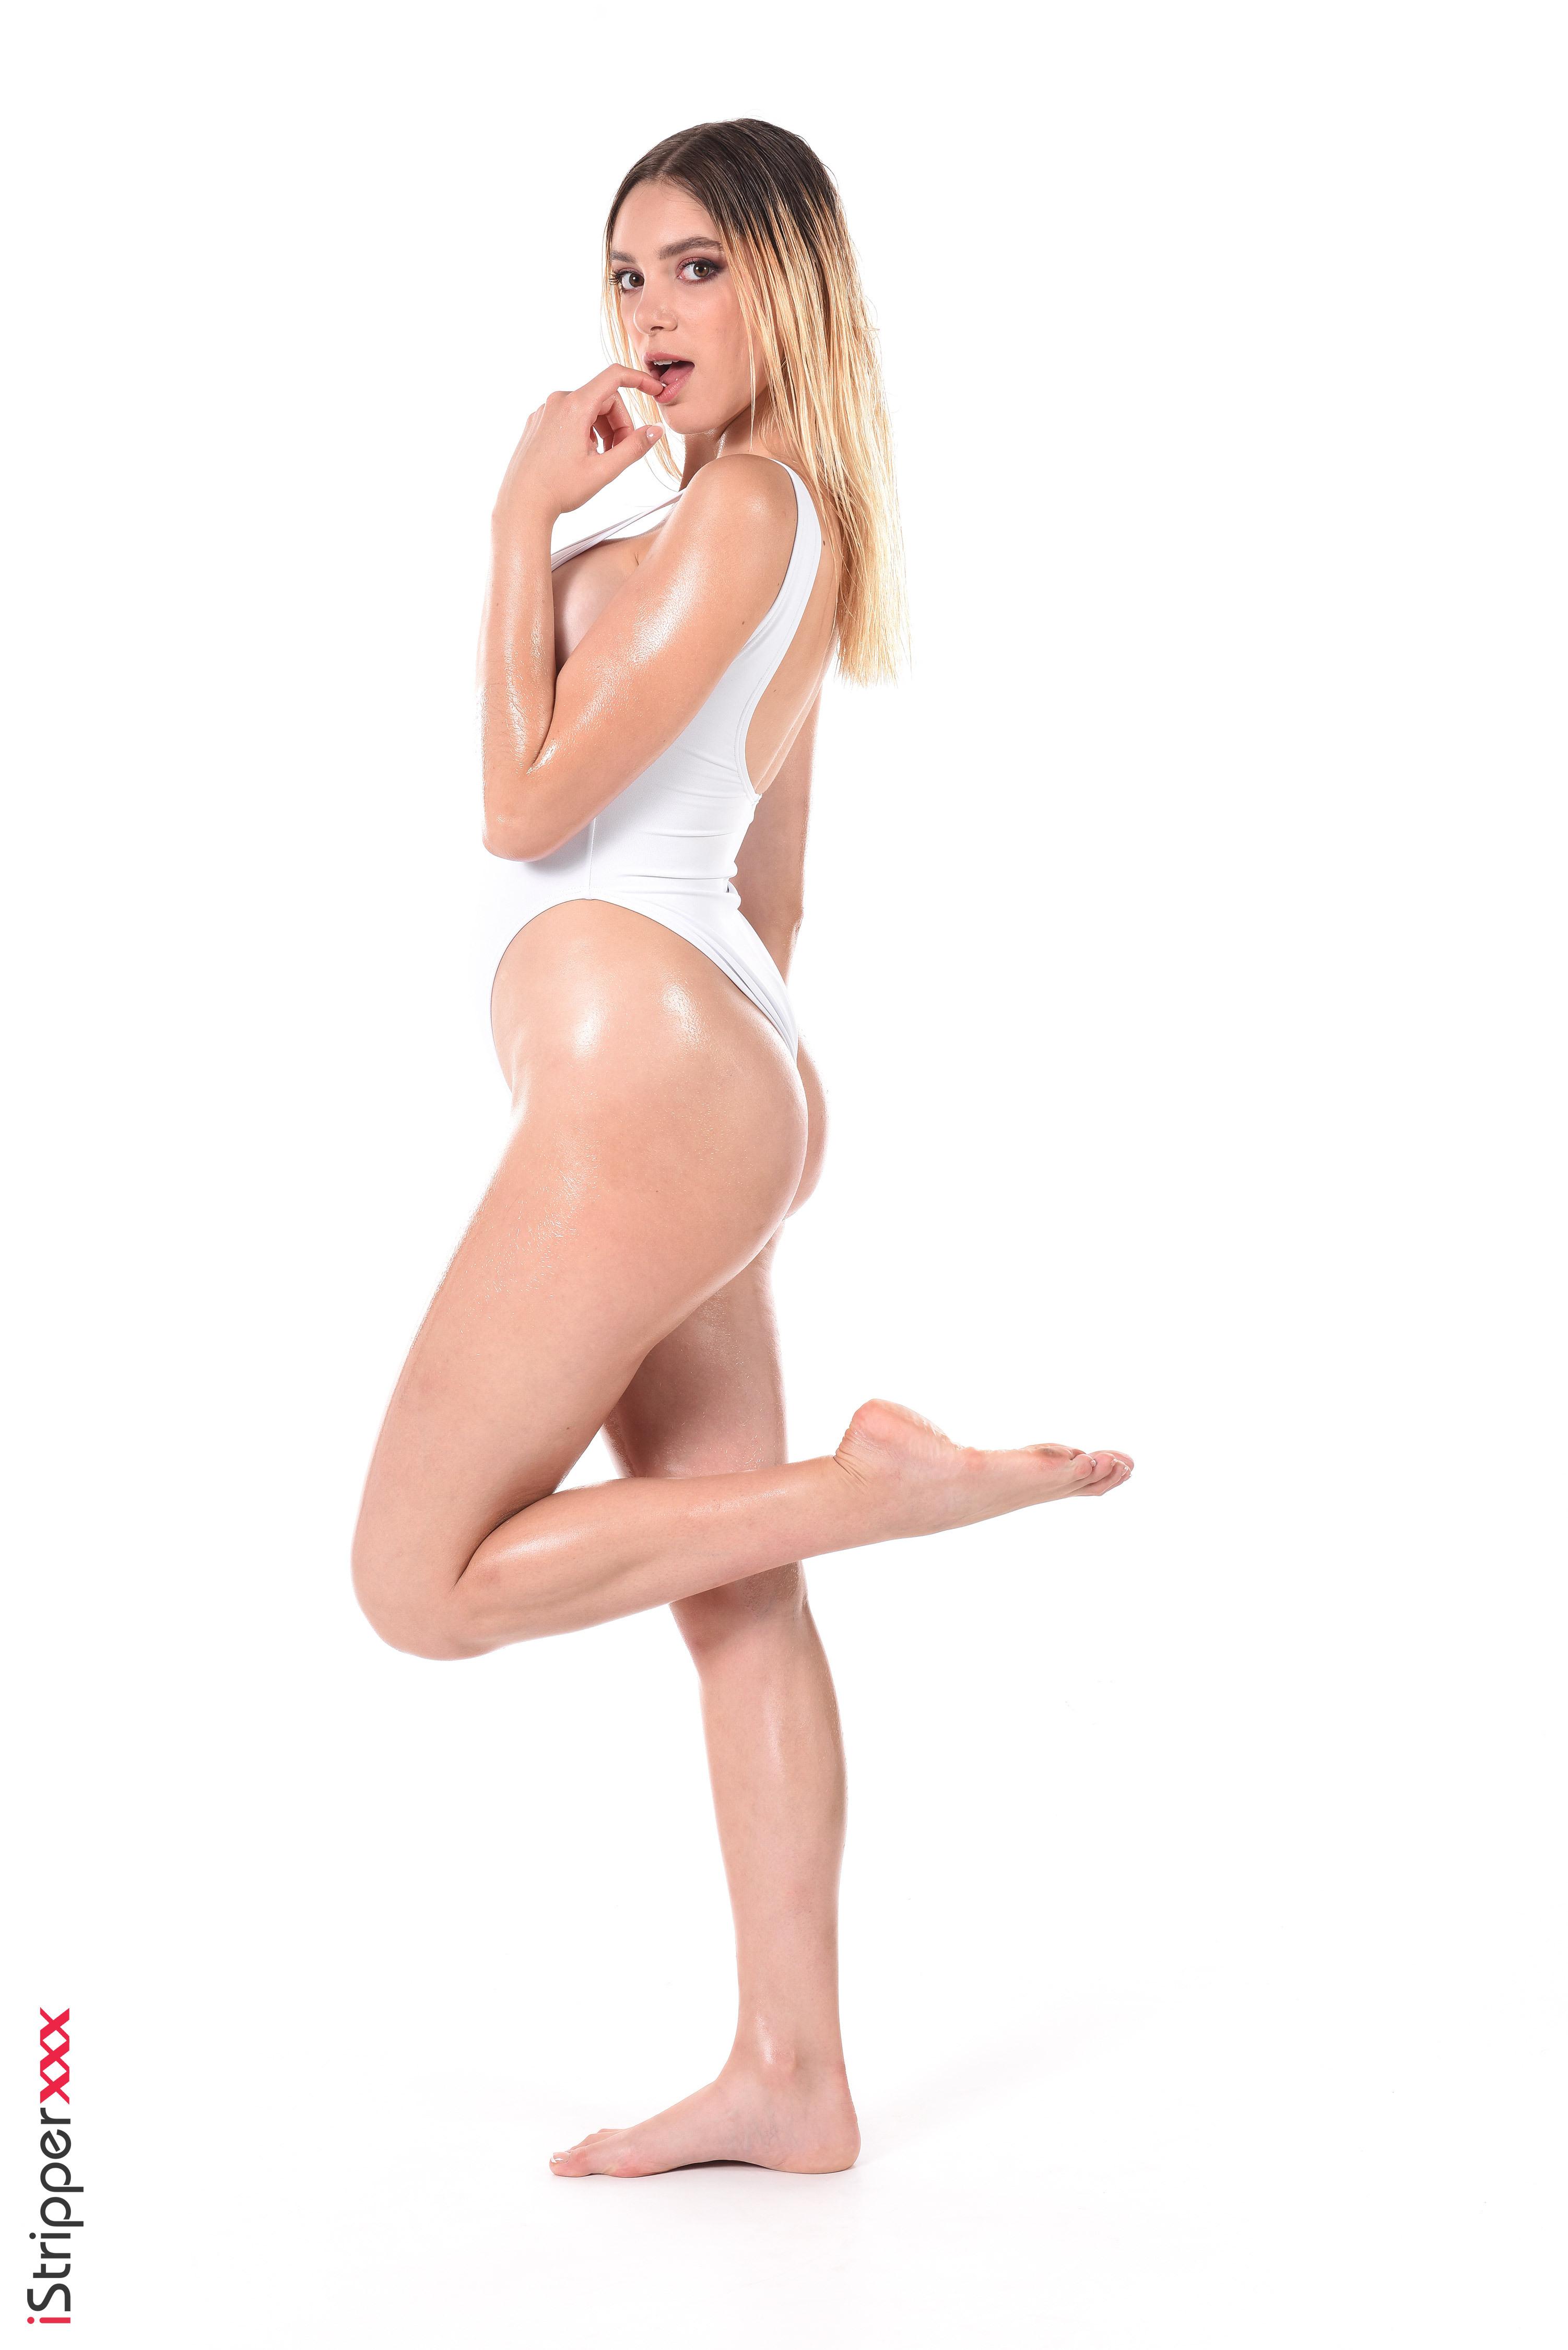 naked blonde wallpaper